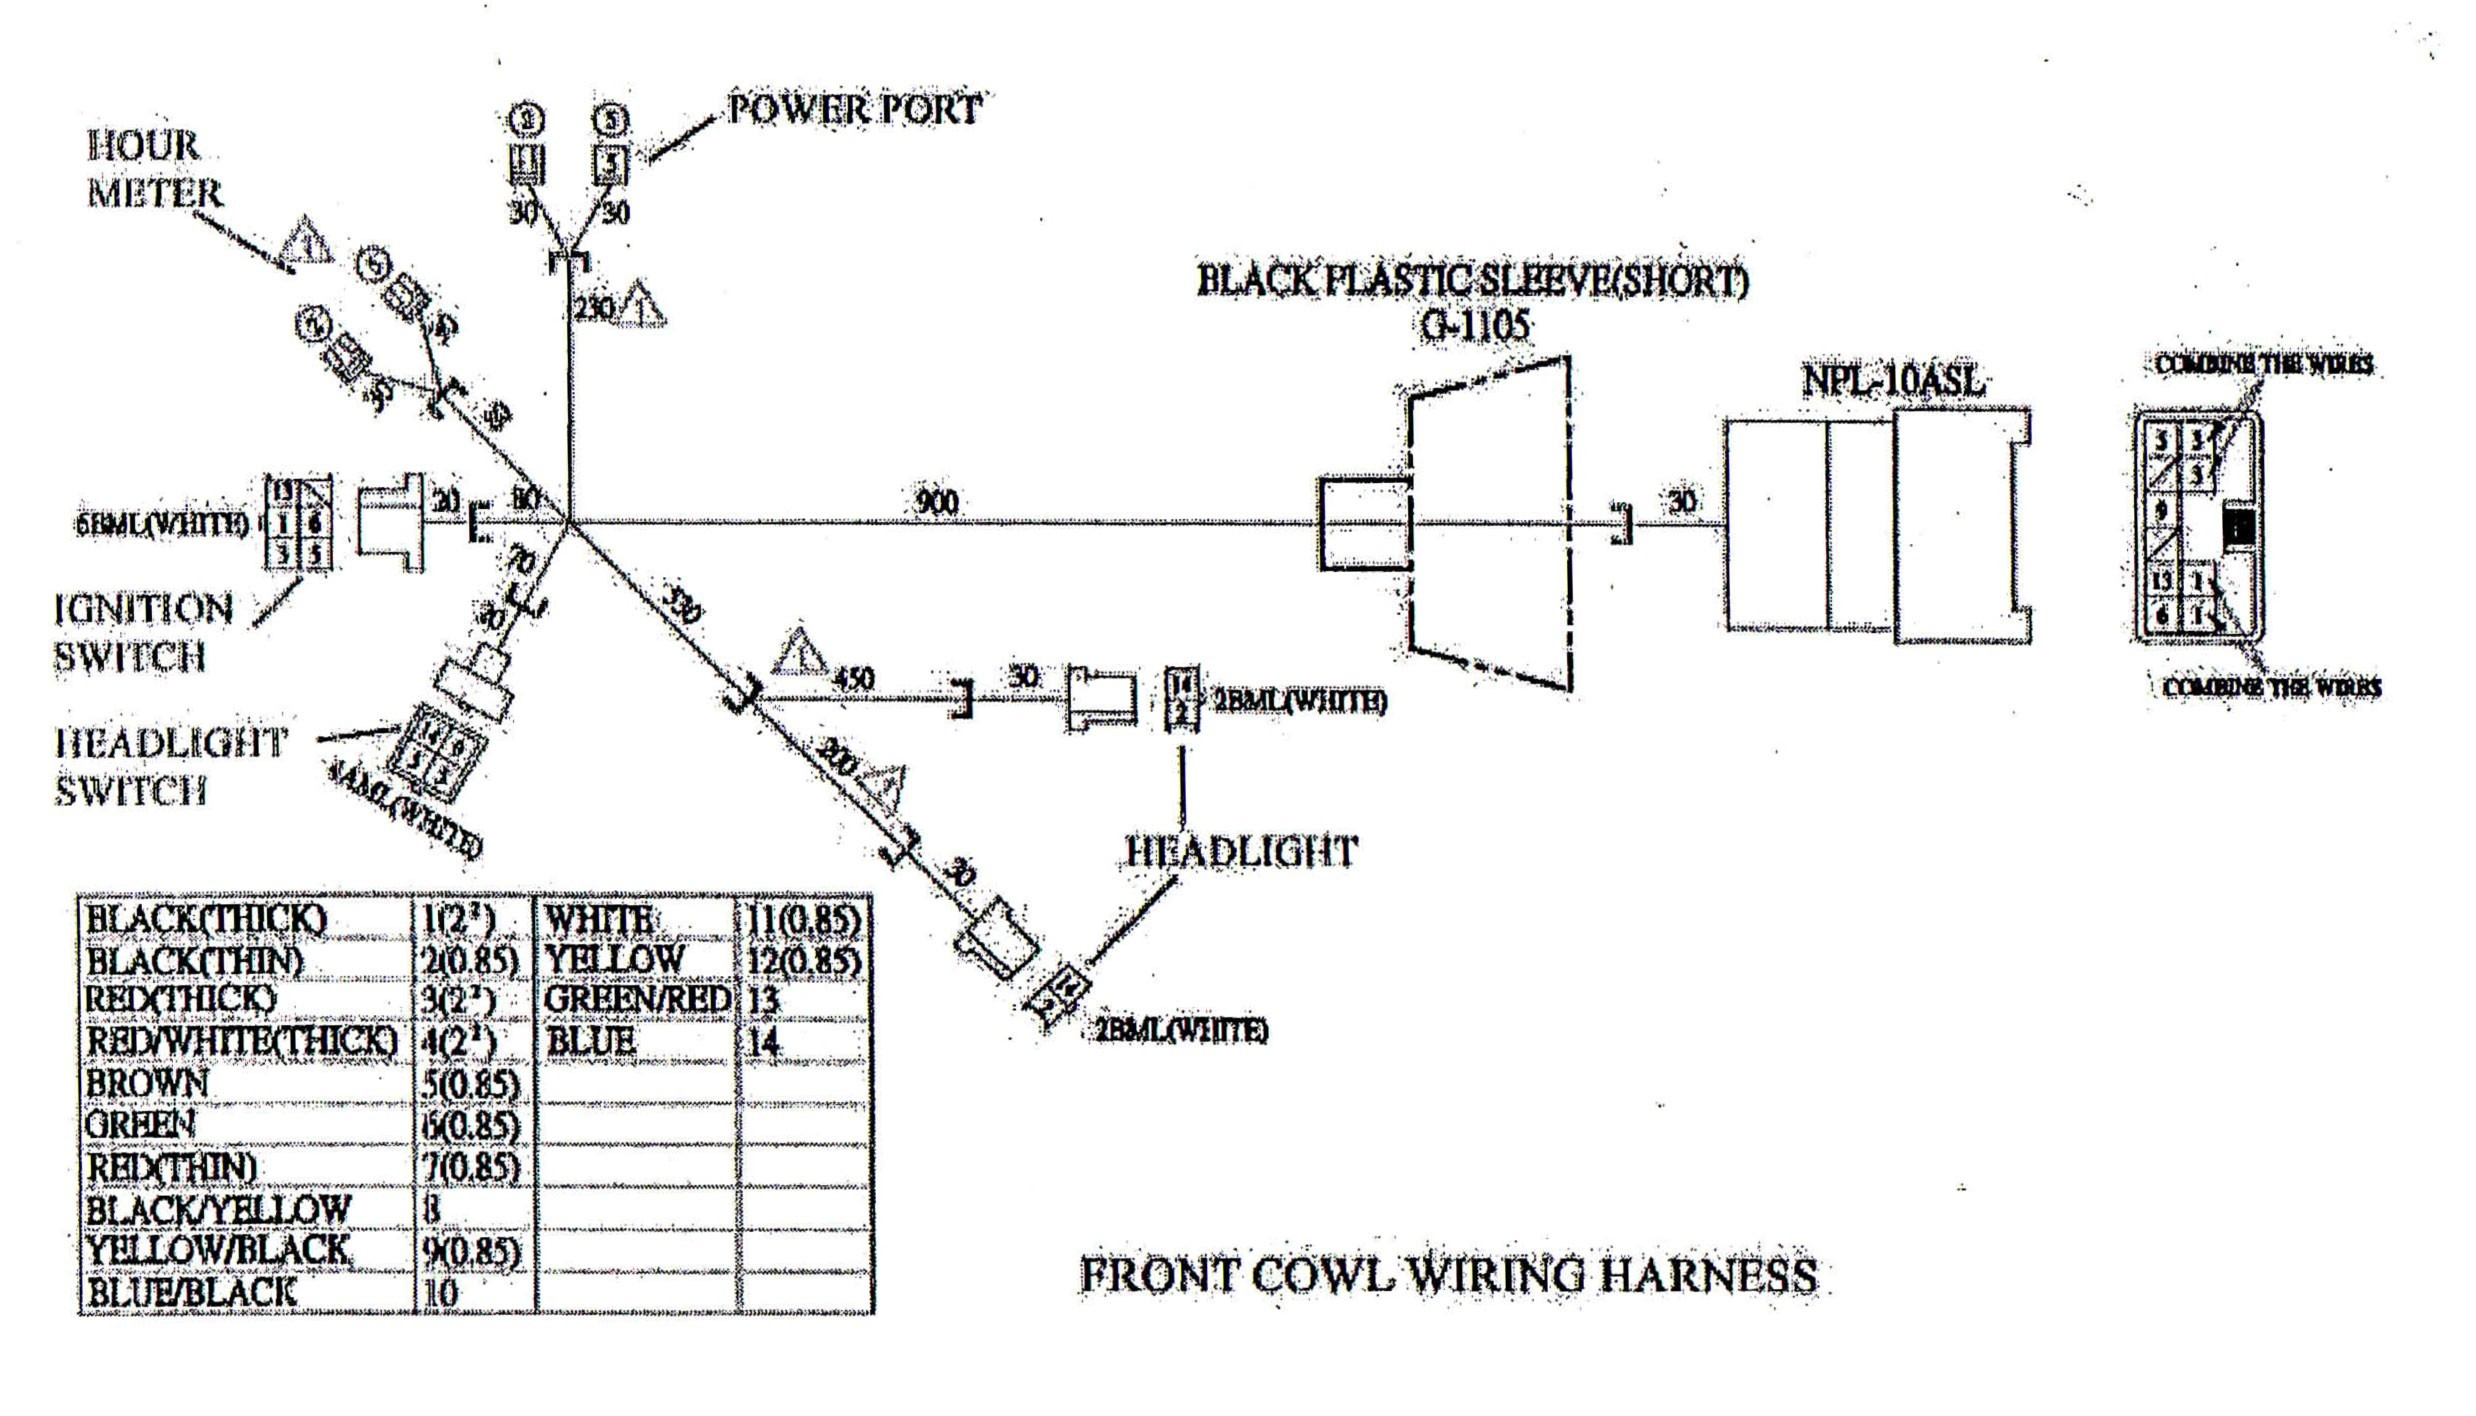 Tecumseh Engine Wiring Worksheet And Diagram Ktm 65 Sx Green Working Rh Detoxicrecenze Com 8 Hp